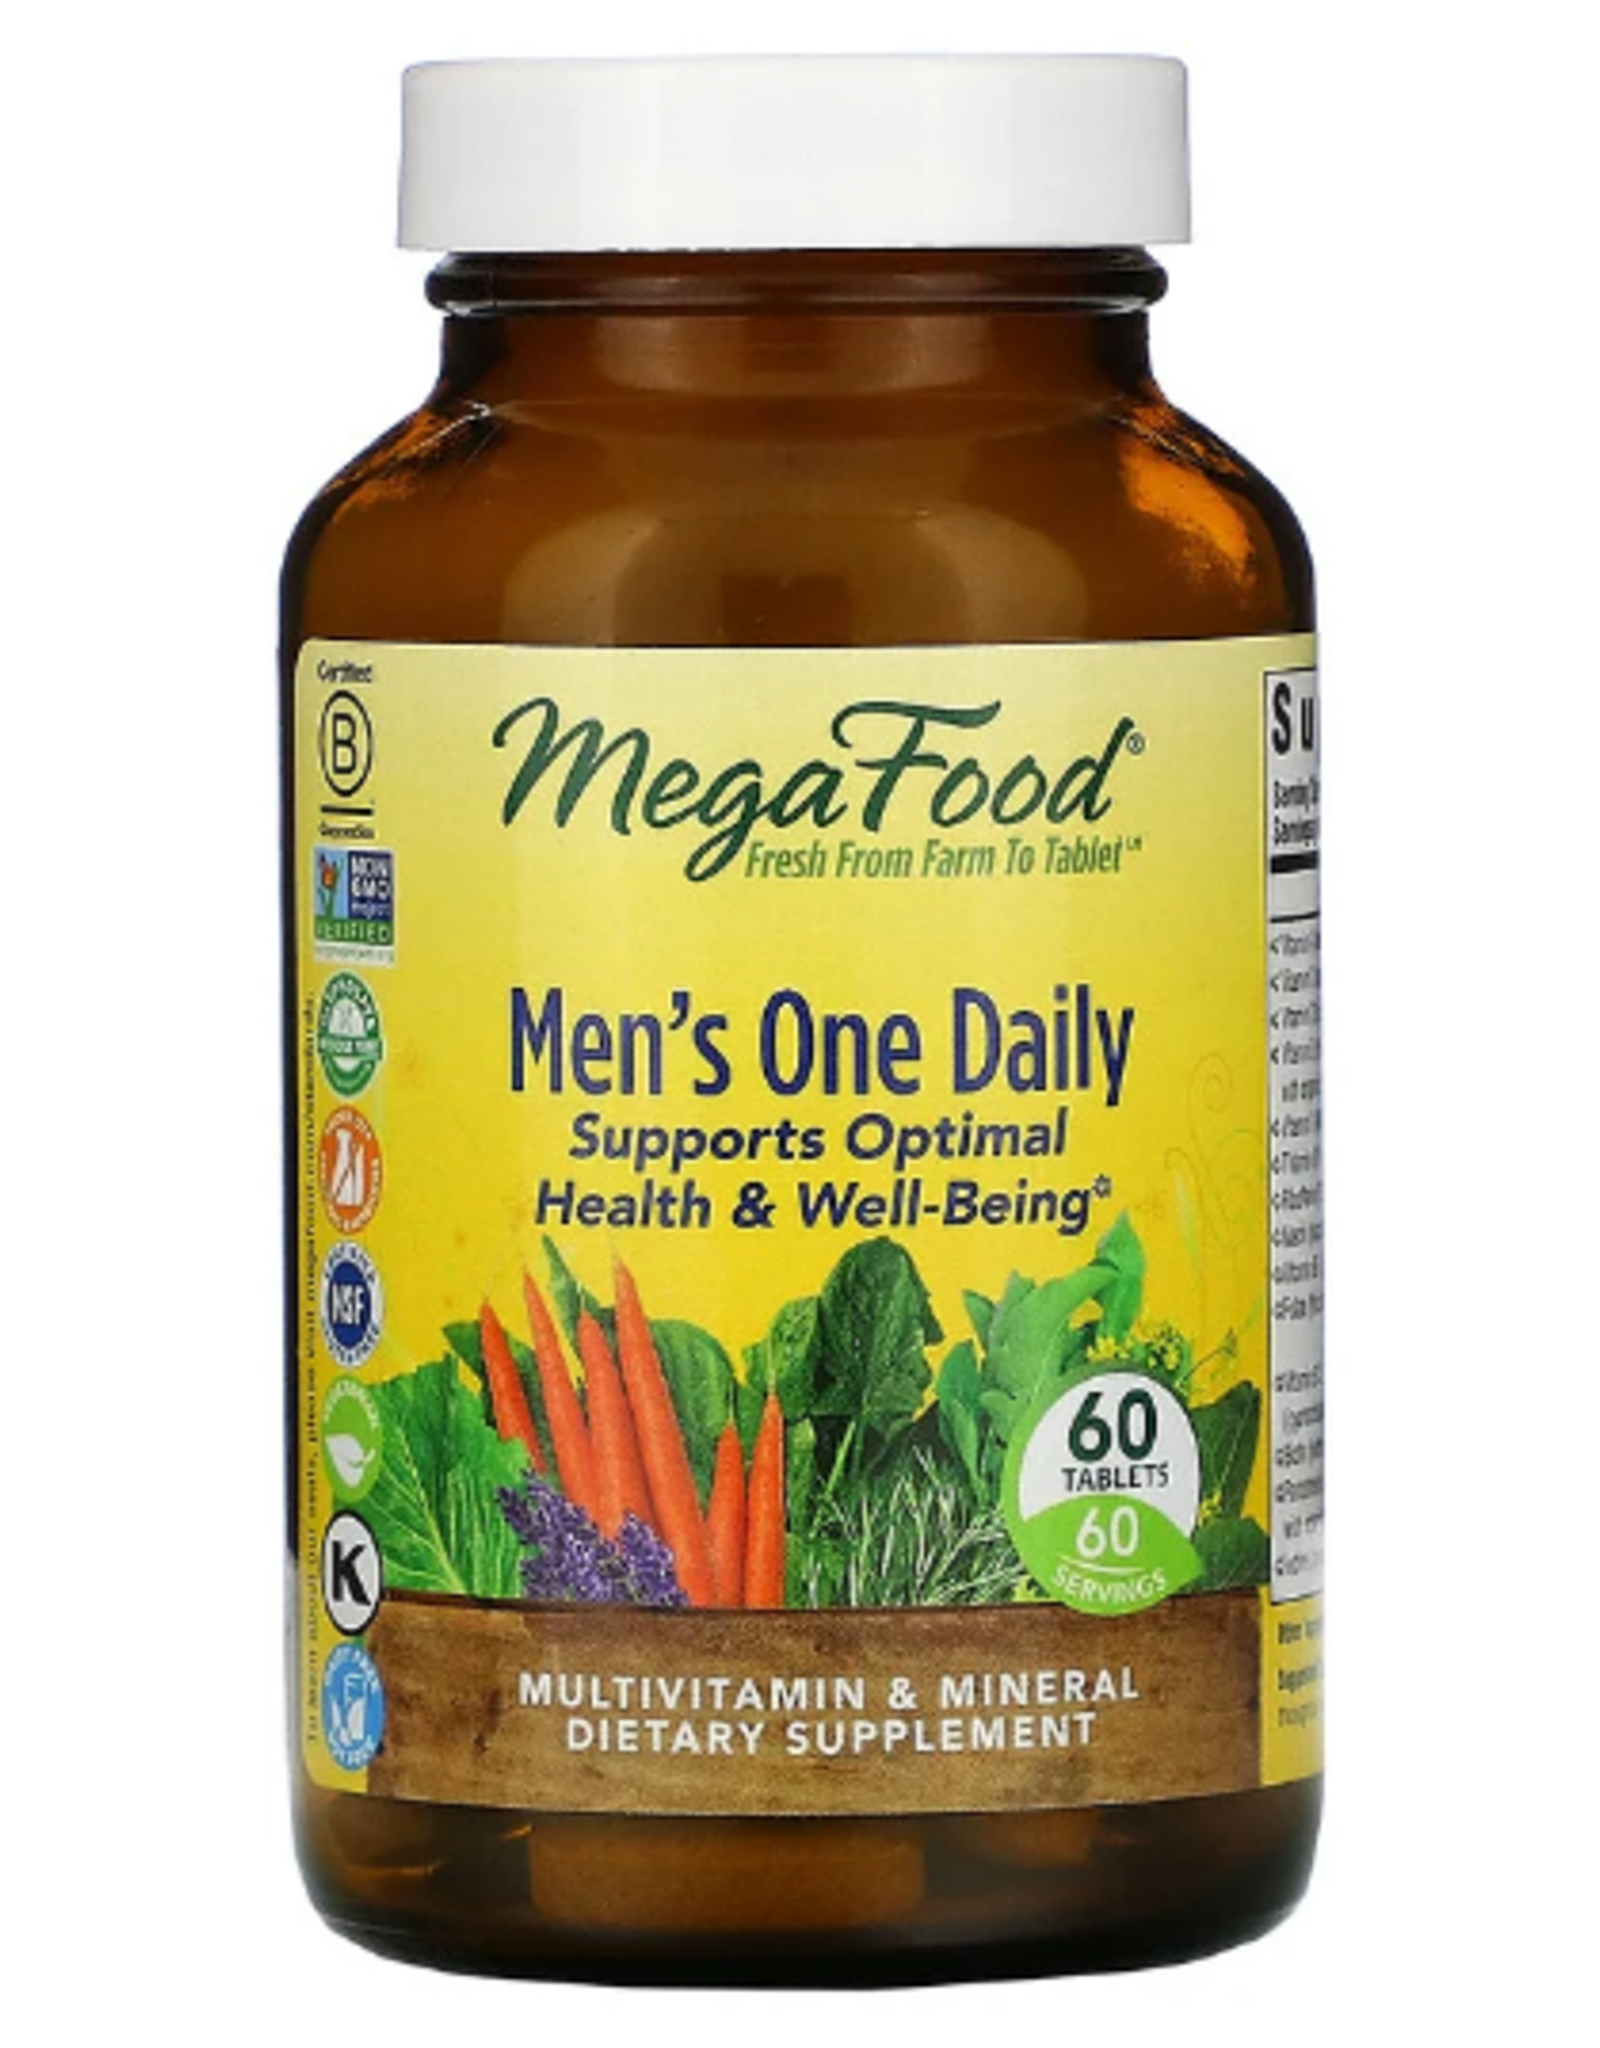 MegaFood MegaFood - Men's One Daily - 60 Tablets